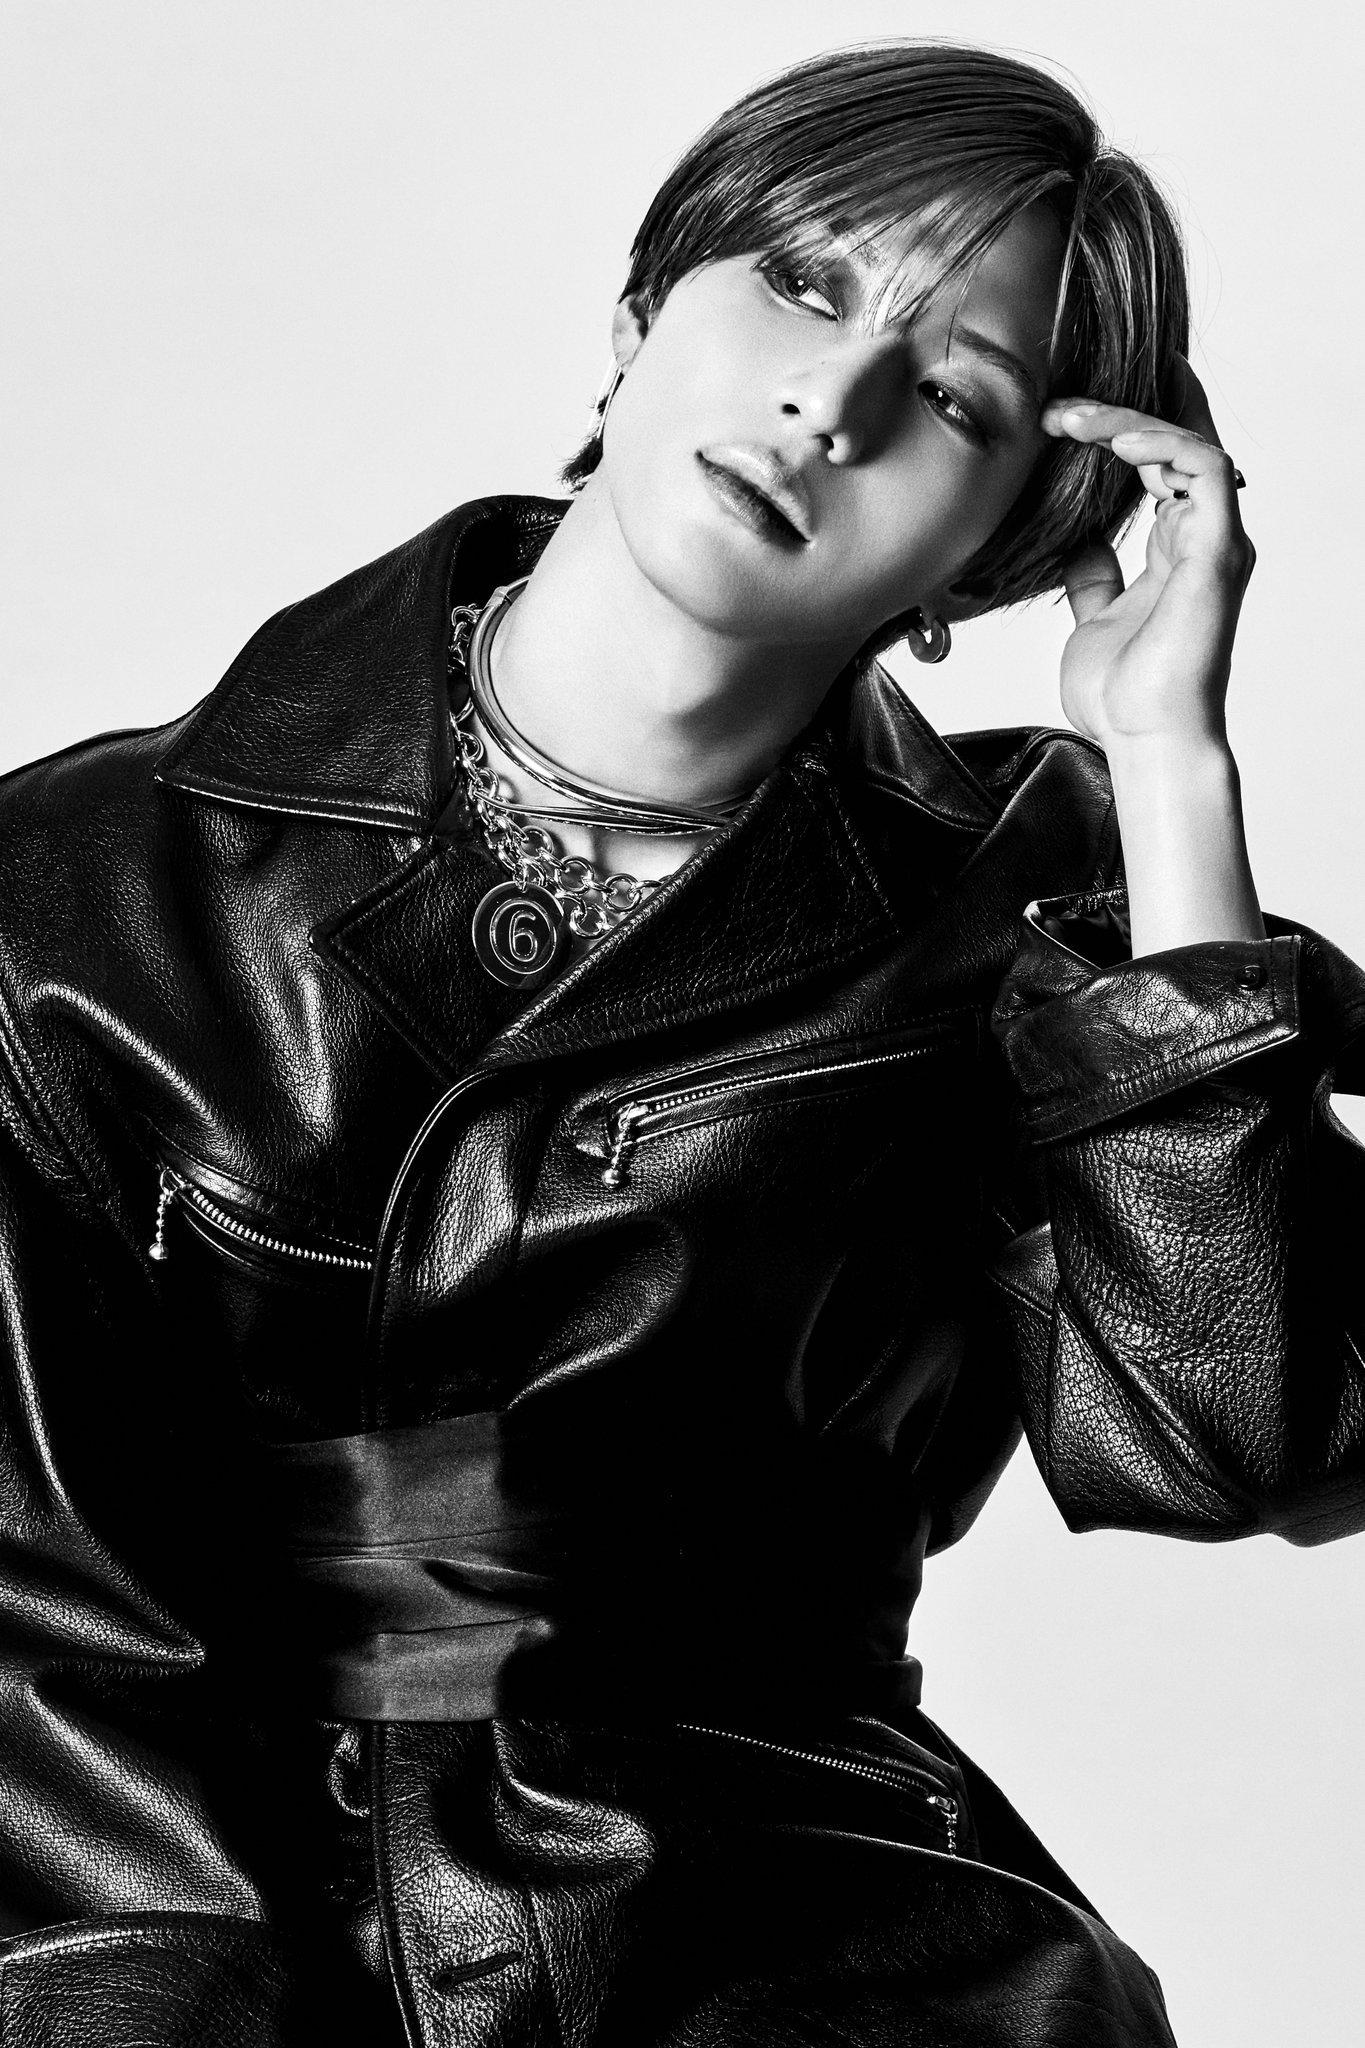 TAEMIN The 2nd Mini Album 'WANT' - Lee Taemin Photo (42299738) - Fanpop